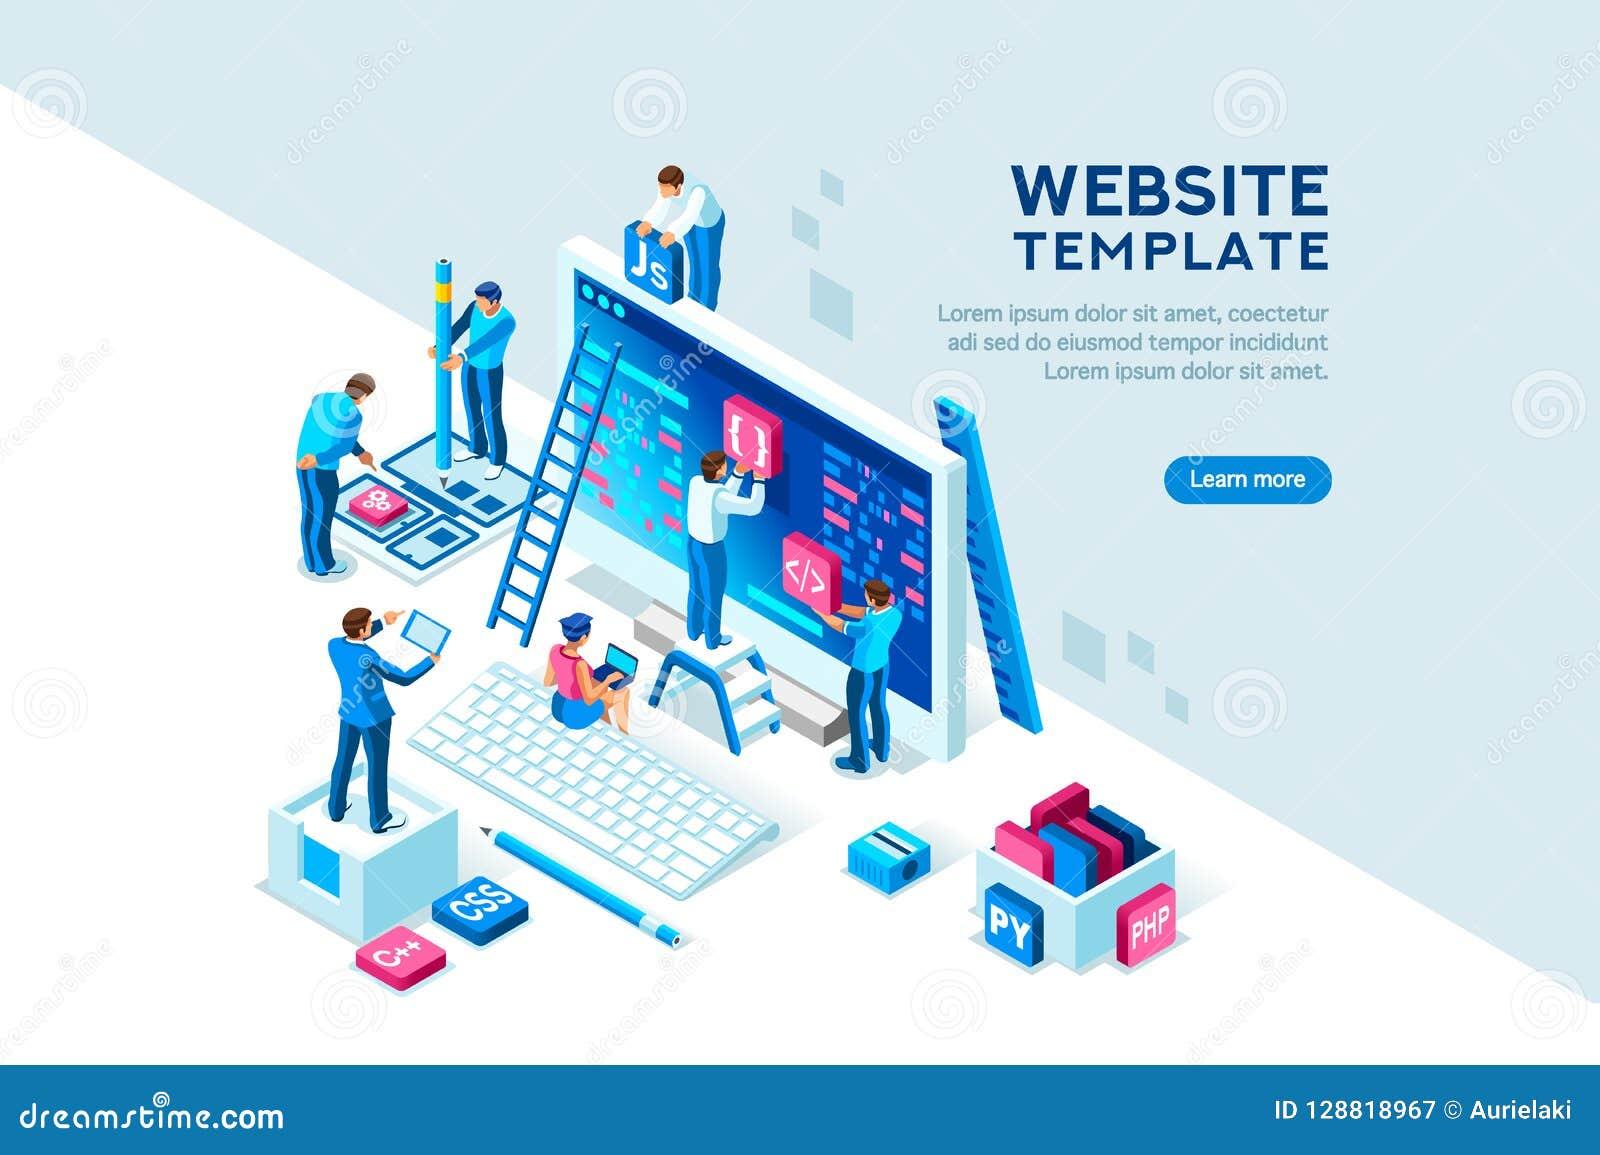 Projekt-Team Office Engineers Characters Web-Schablone